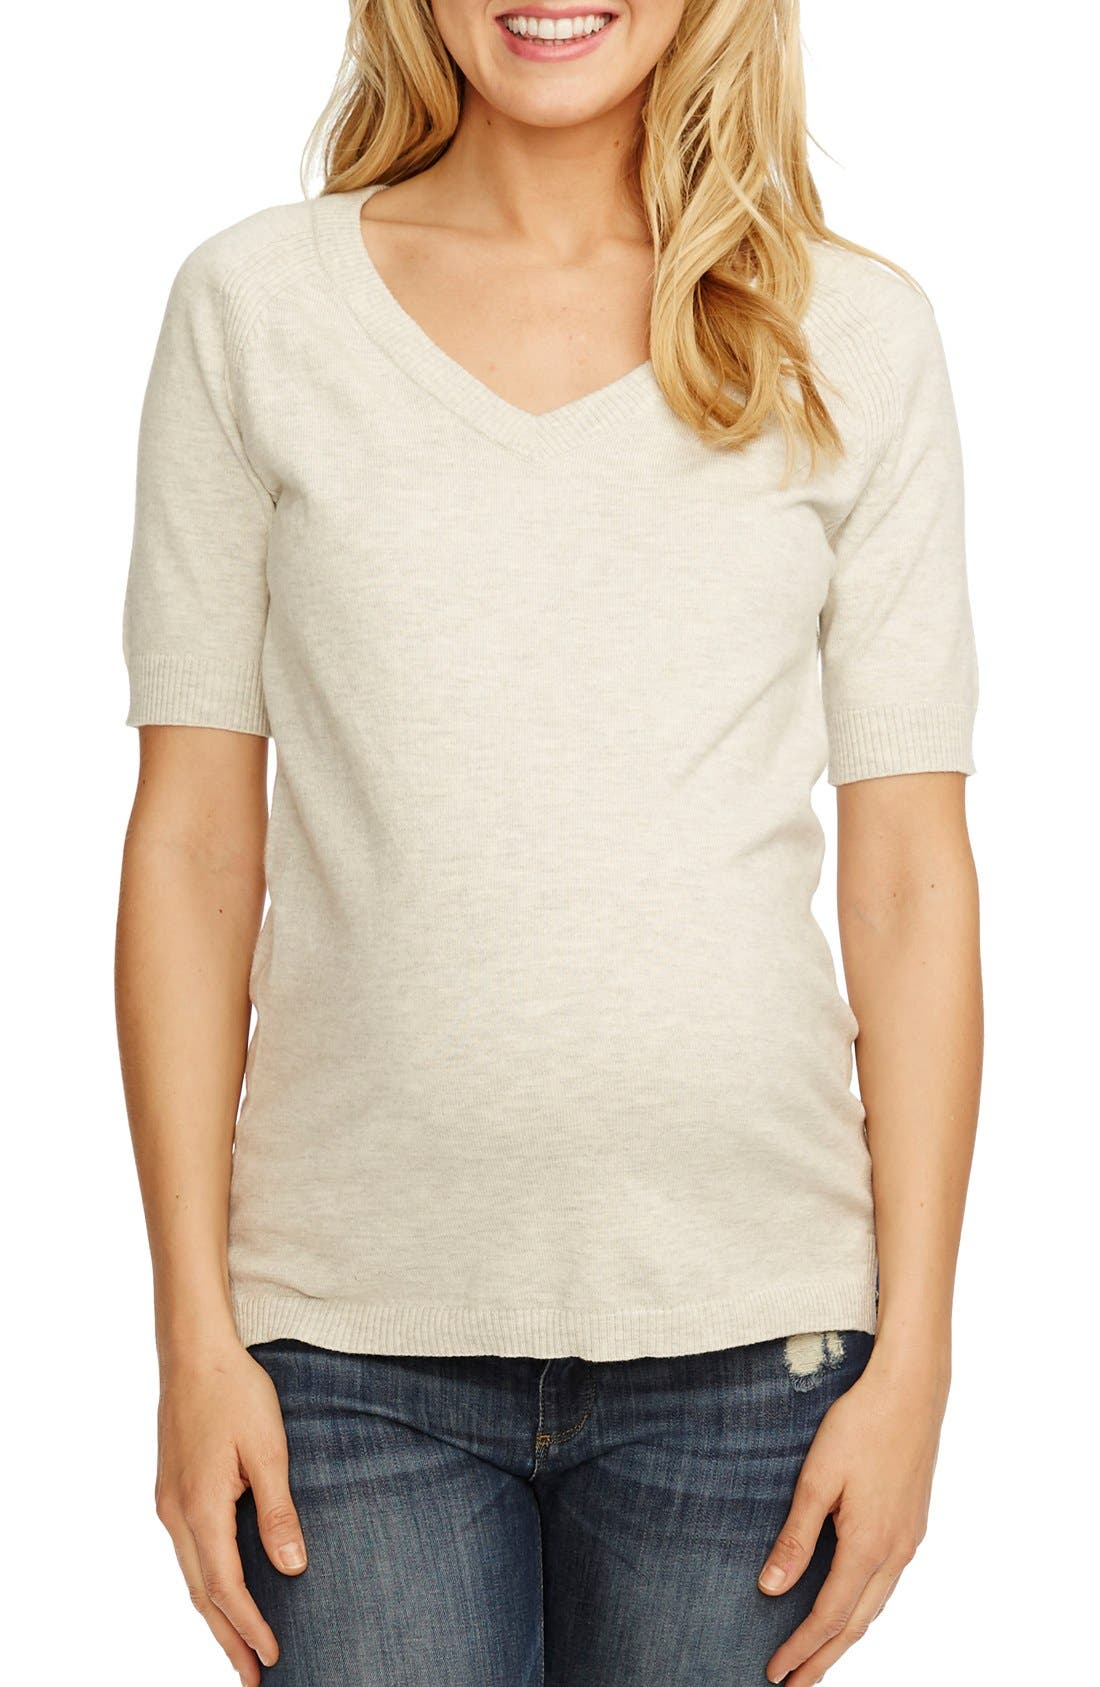 Alternate Image 1 Selected - Rosie Pope 'Avery' V-Neck Maternity Sweater